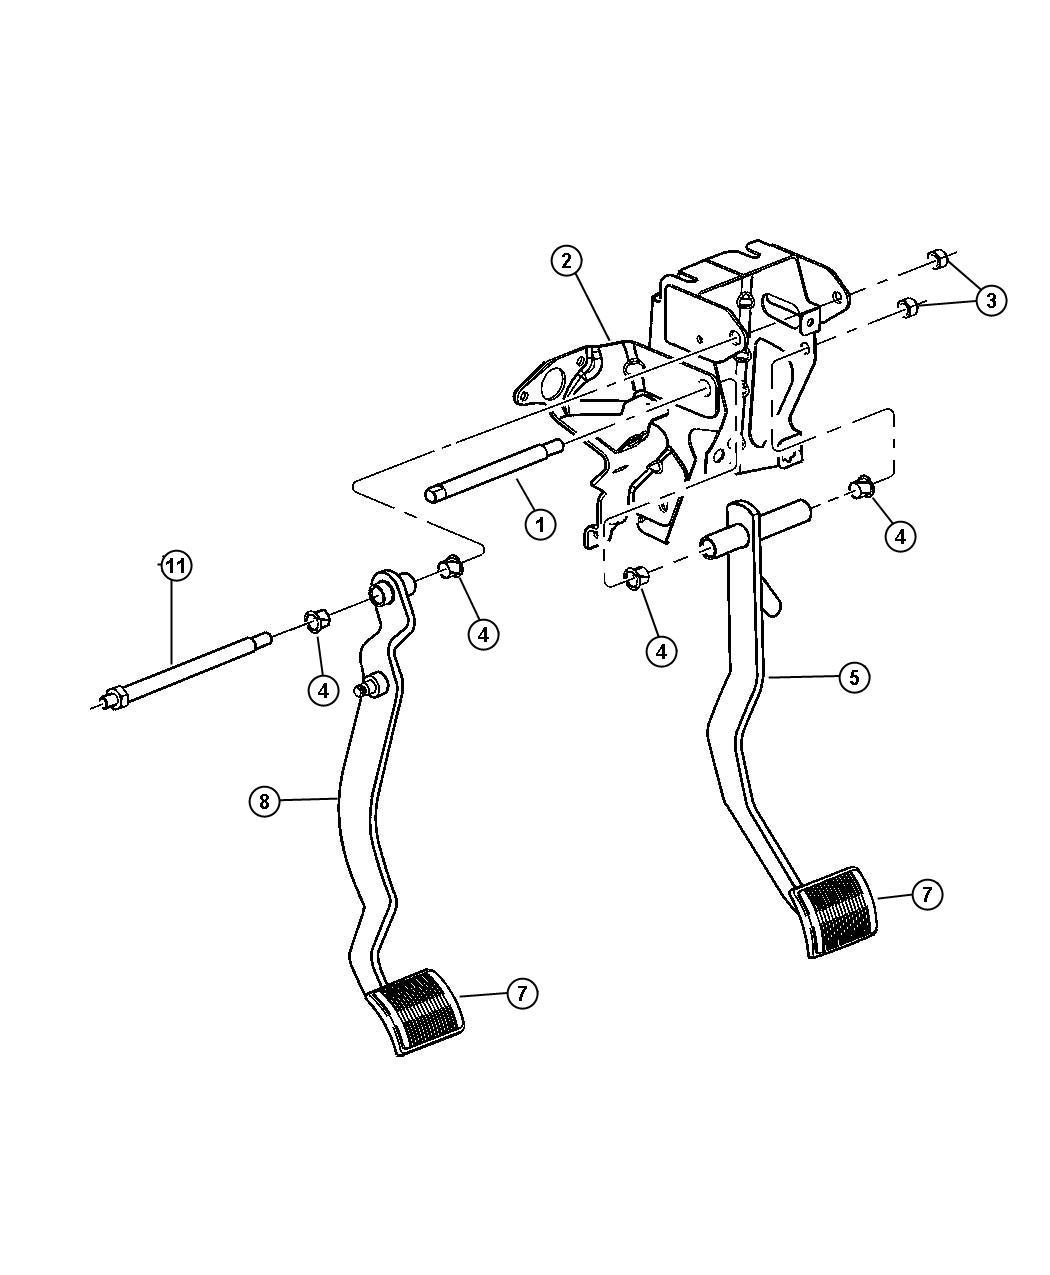 Dodge Stratus Pad Brake Pedal Manual Transmission